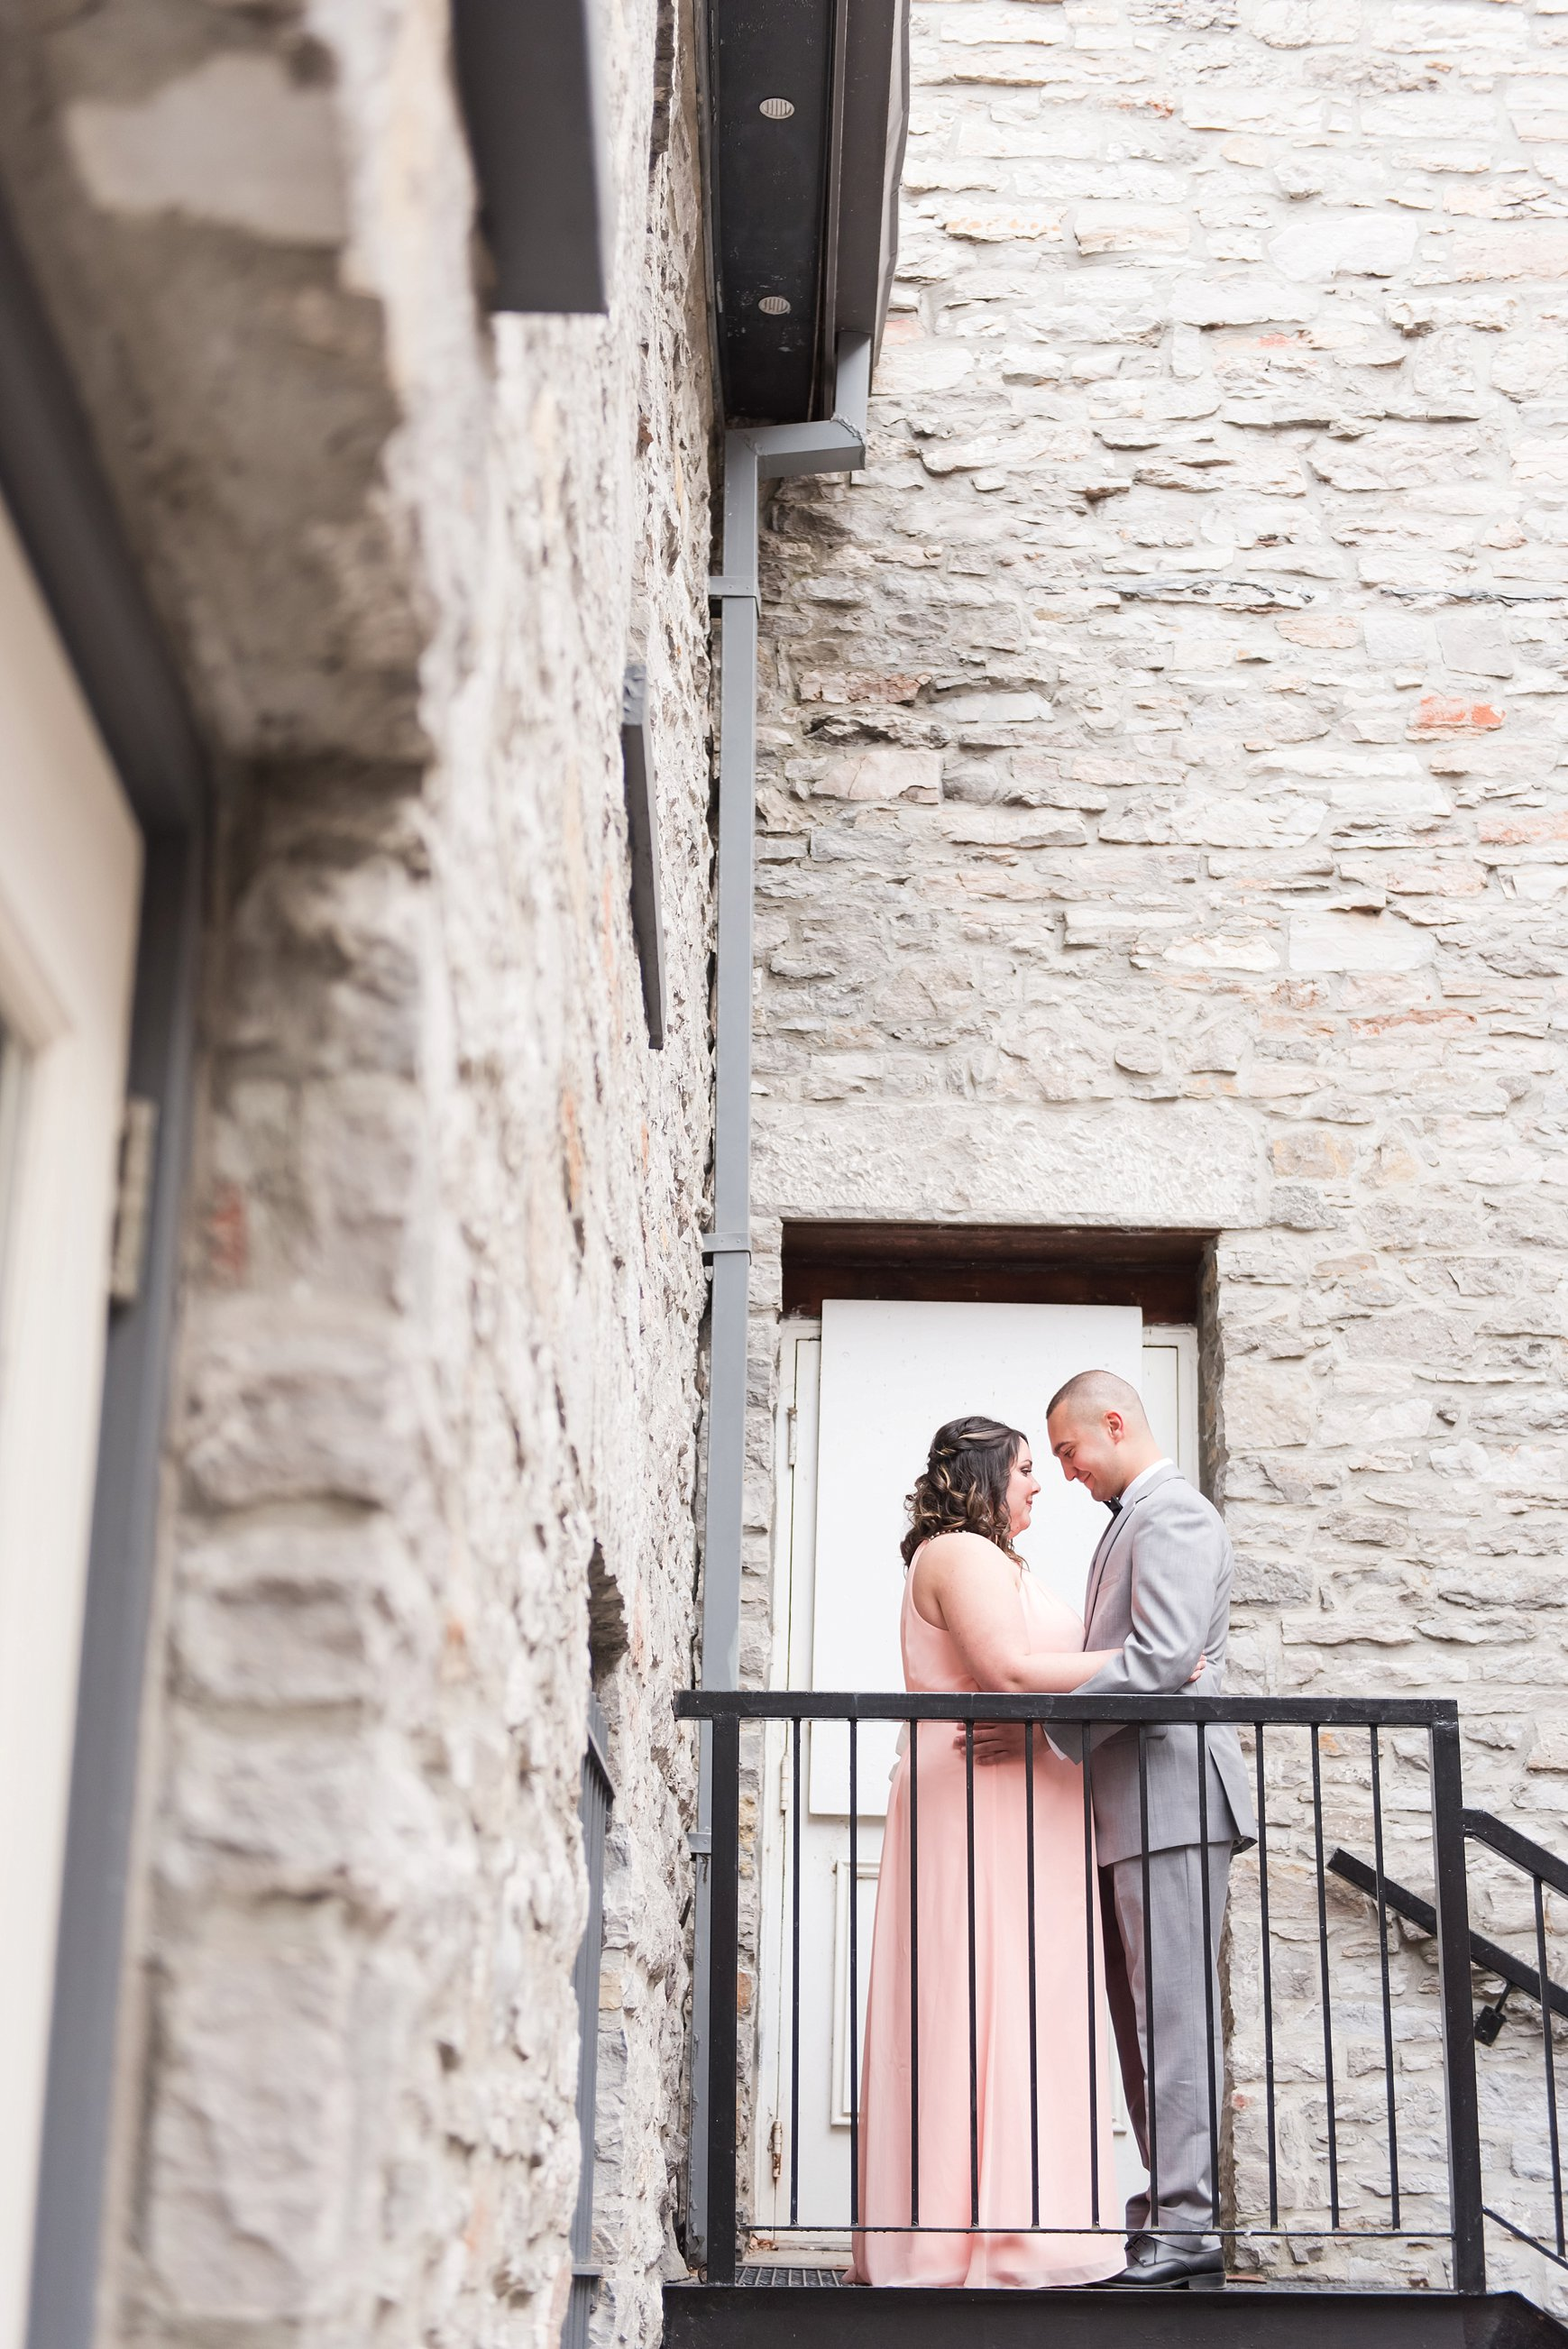 Sarmad Ashley Engagement Shoot- Ali Batoul Creatives Fine Art Wedding Photography_0047.jpg